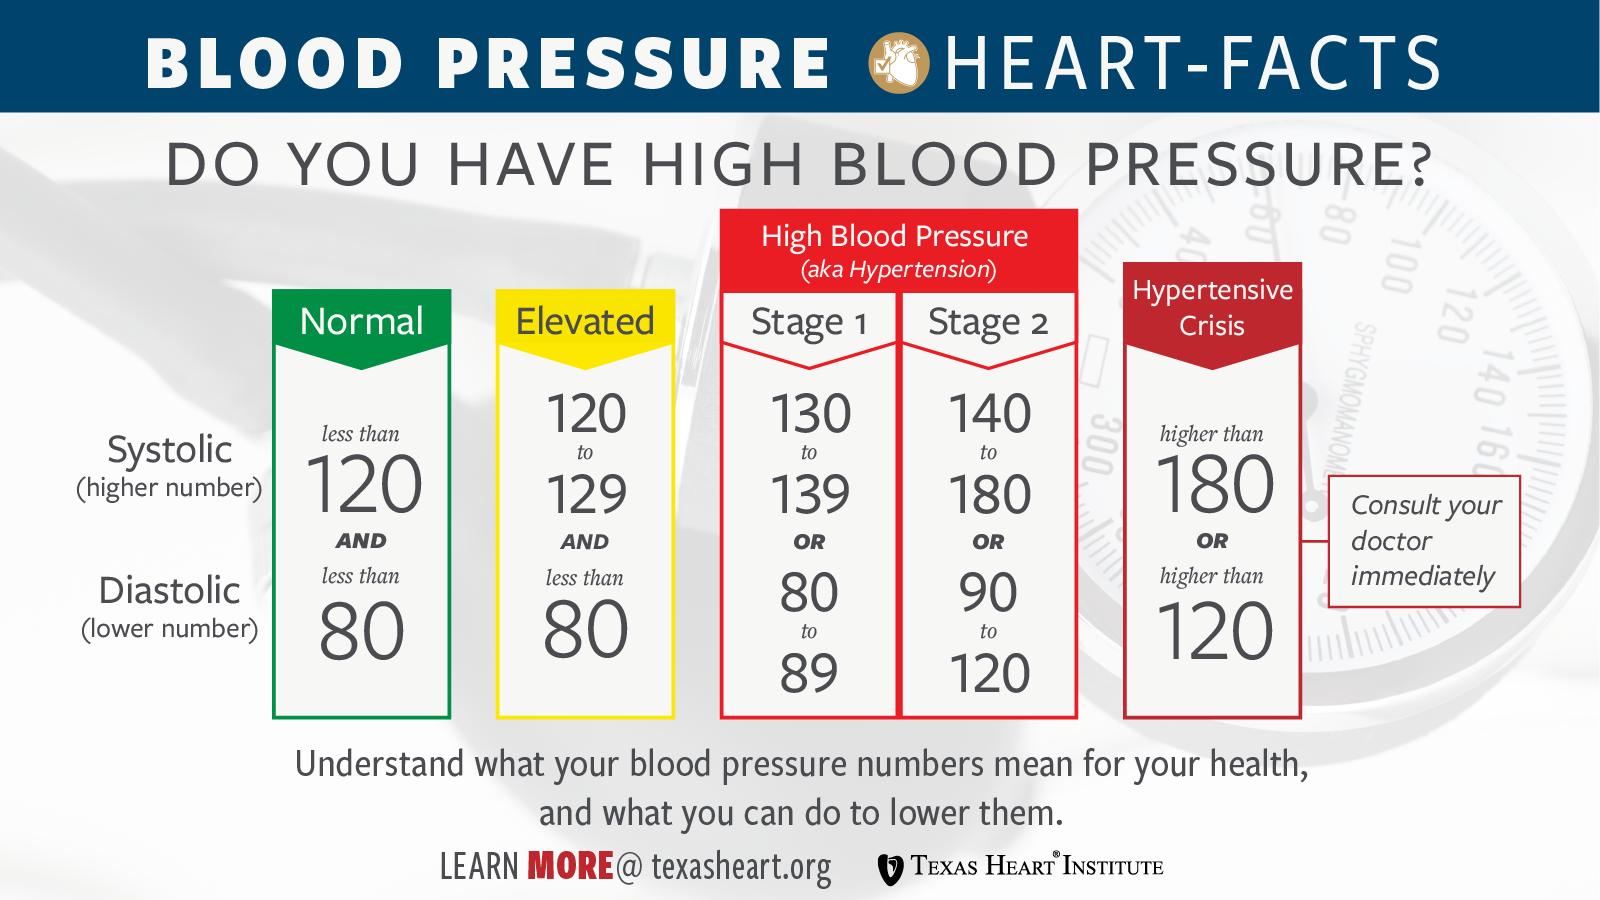 puls 40 s hipertenzijom